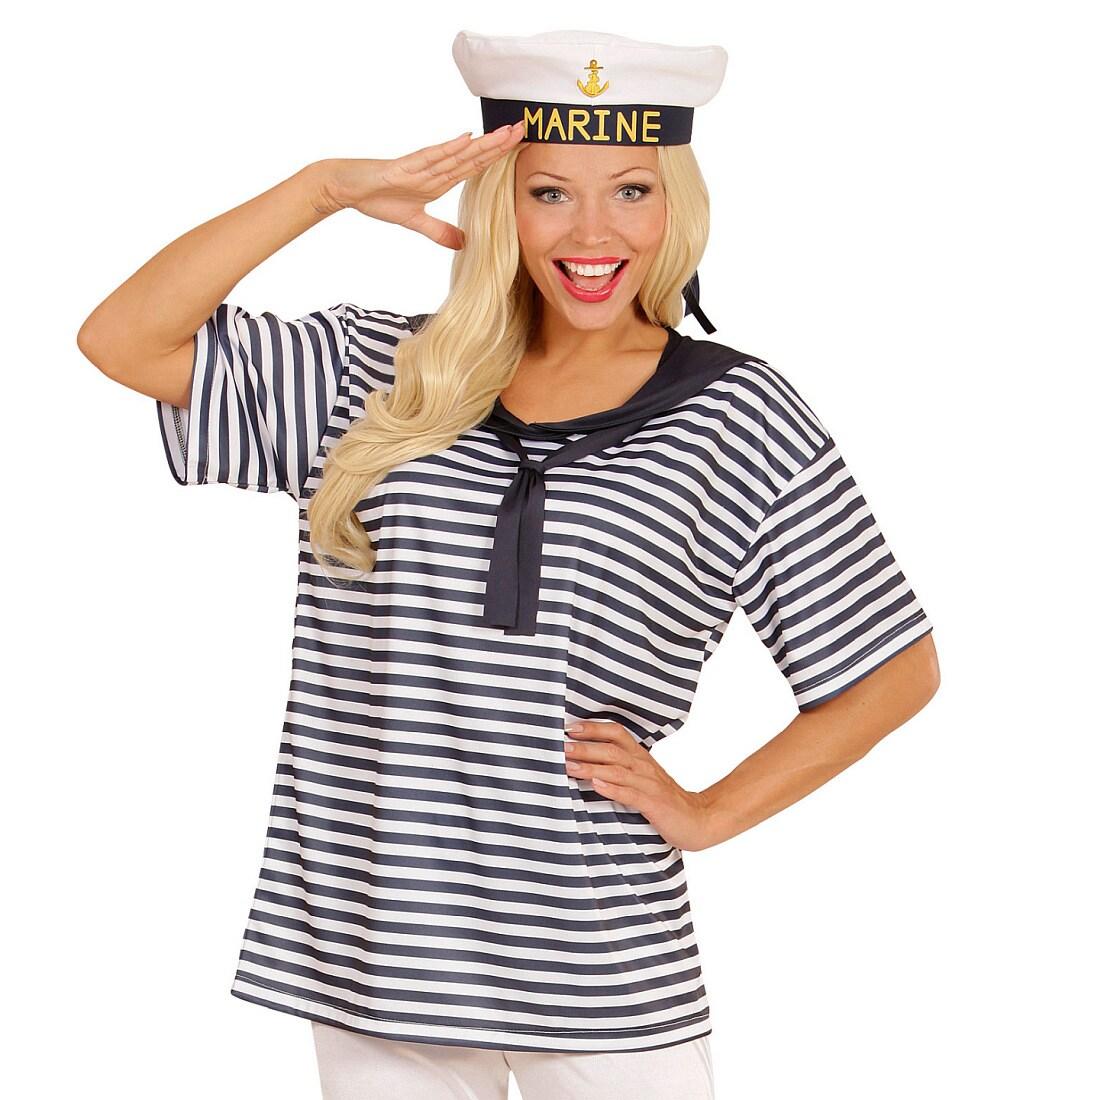 Maritimes Matrosen-Shirt Schiffermütze Matrosen Kostümset aus Mütze und Hemd